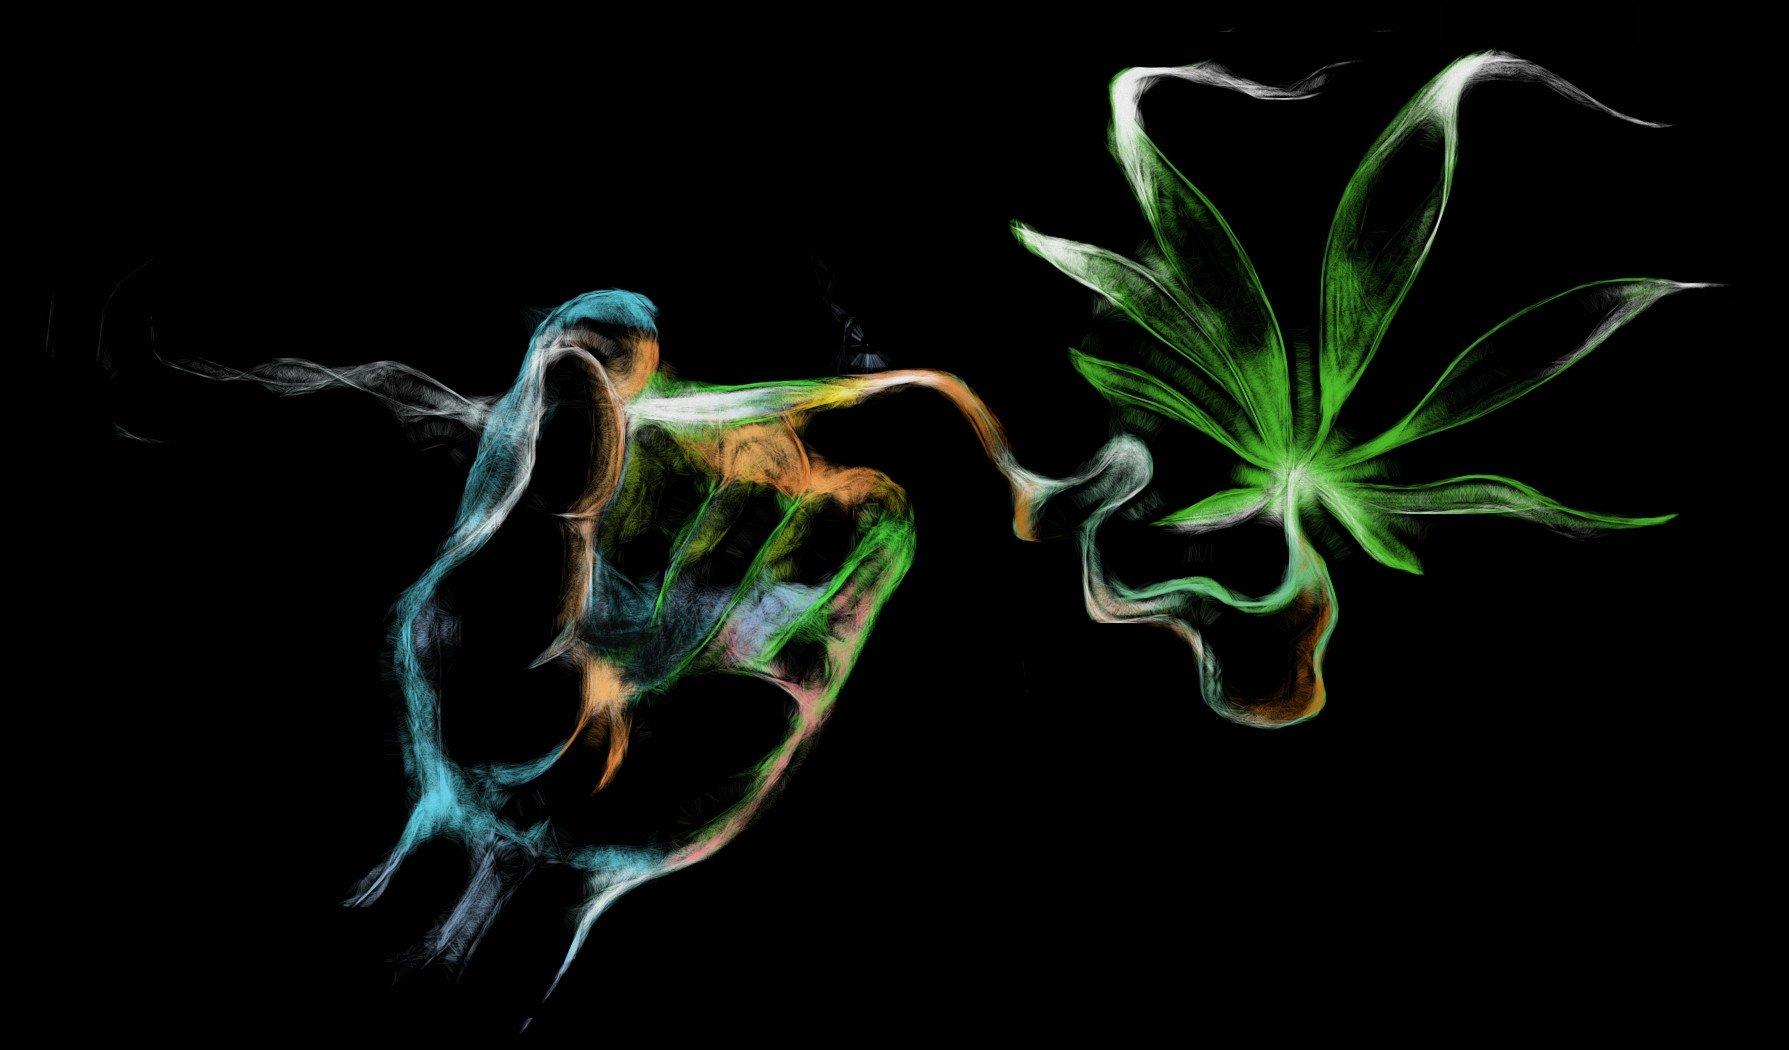 marijuana wallpaper 1680x1050 - photo #26